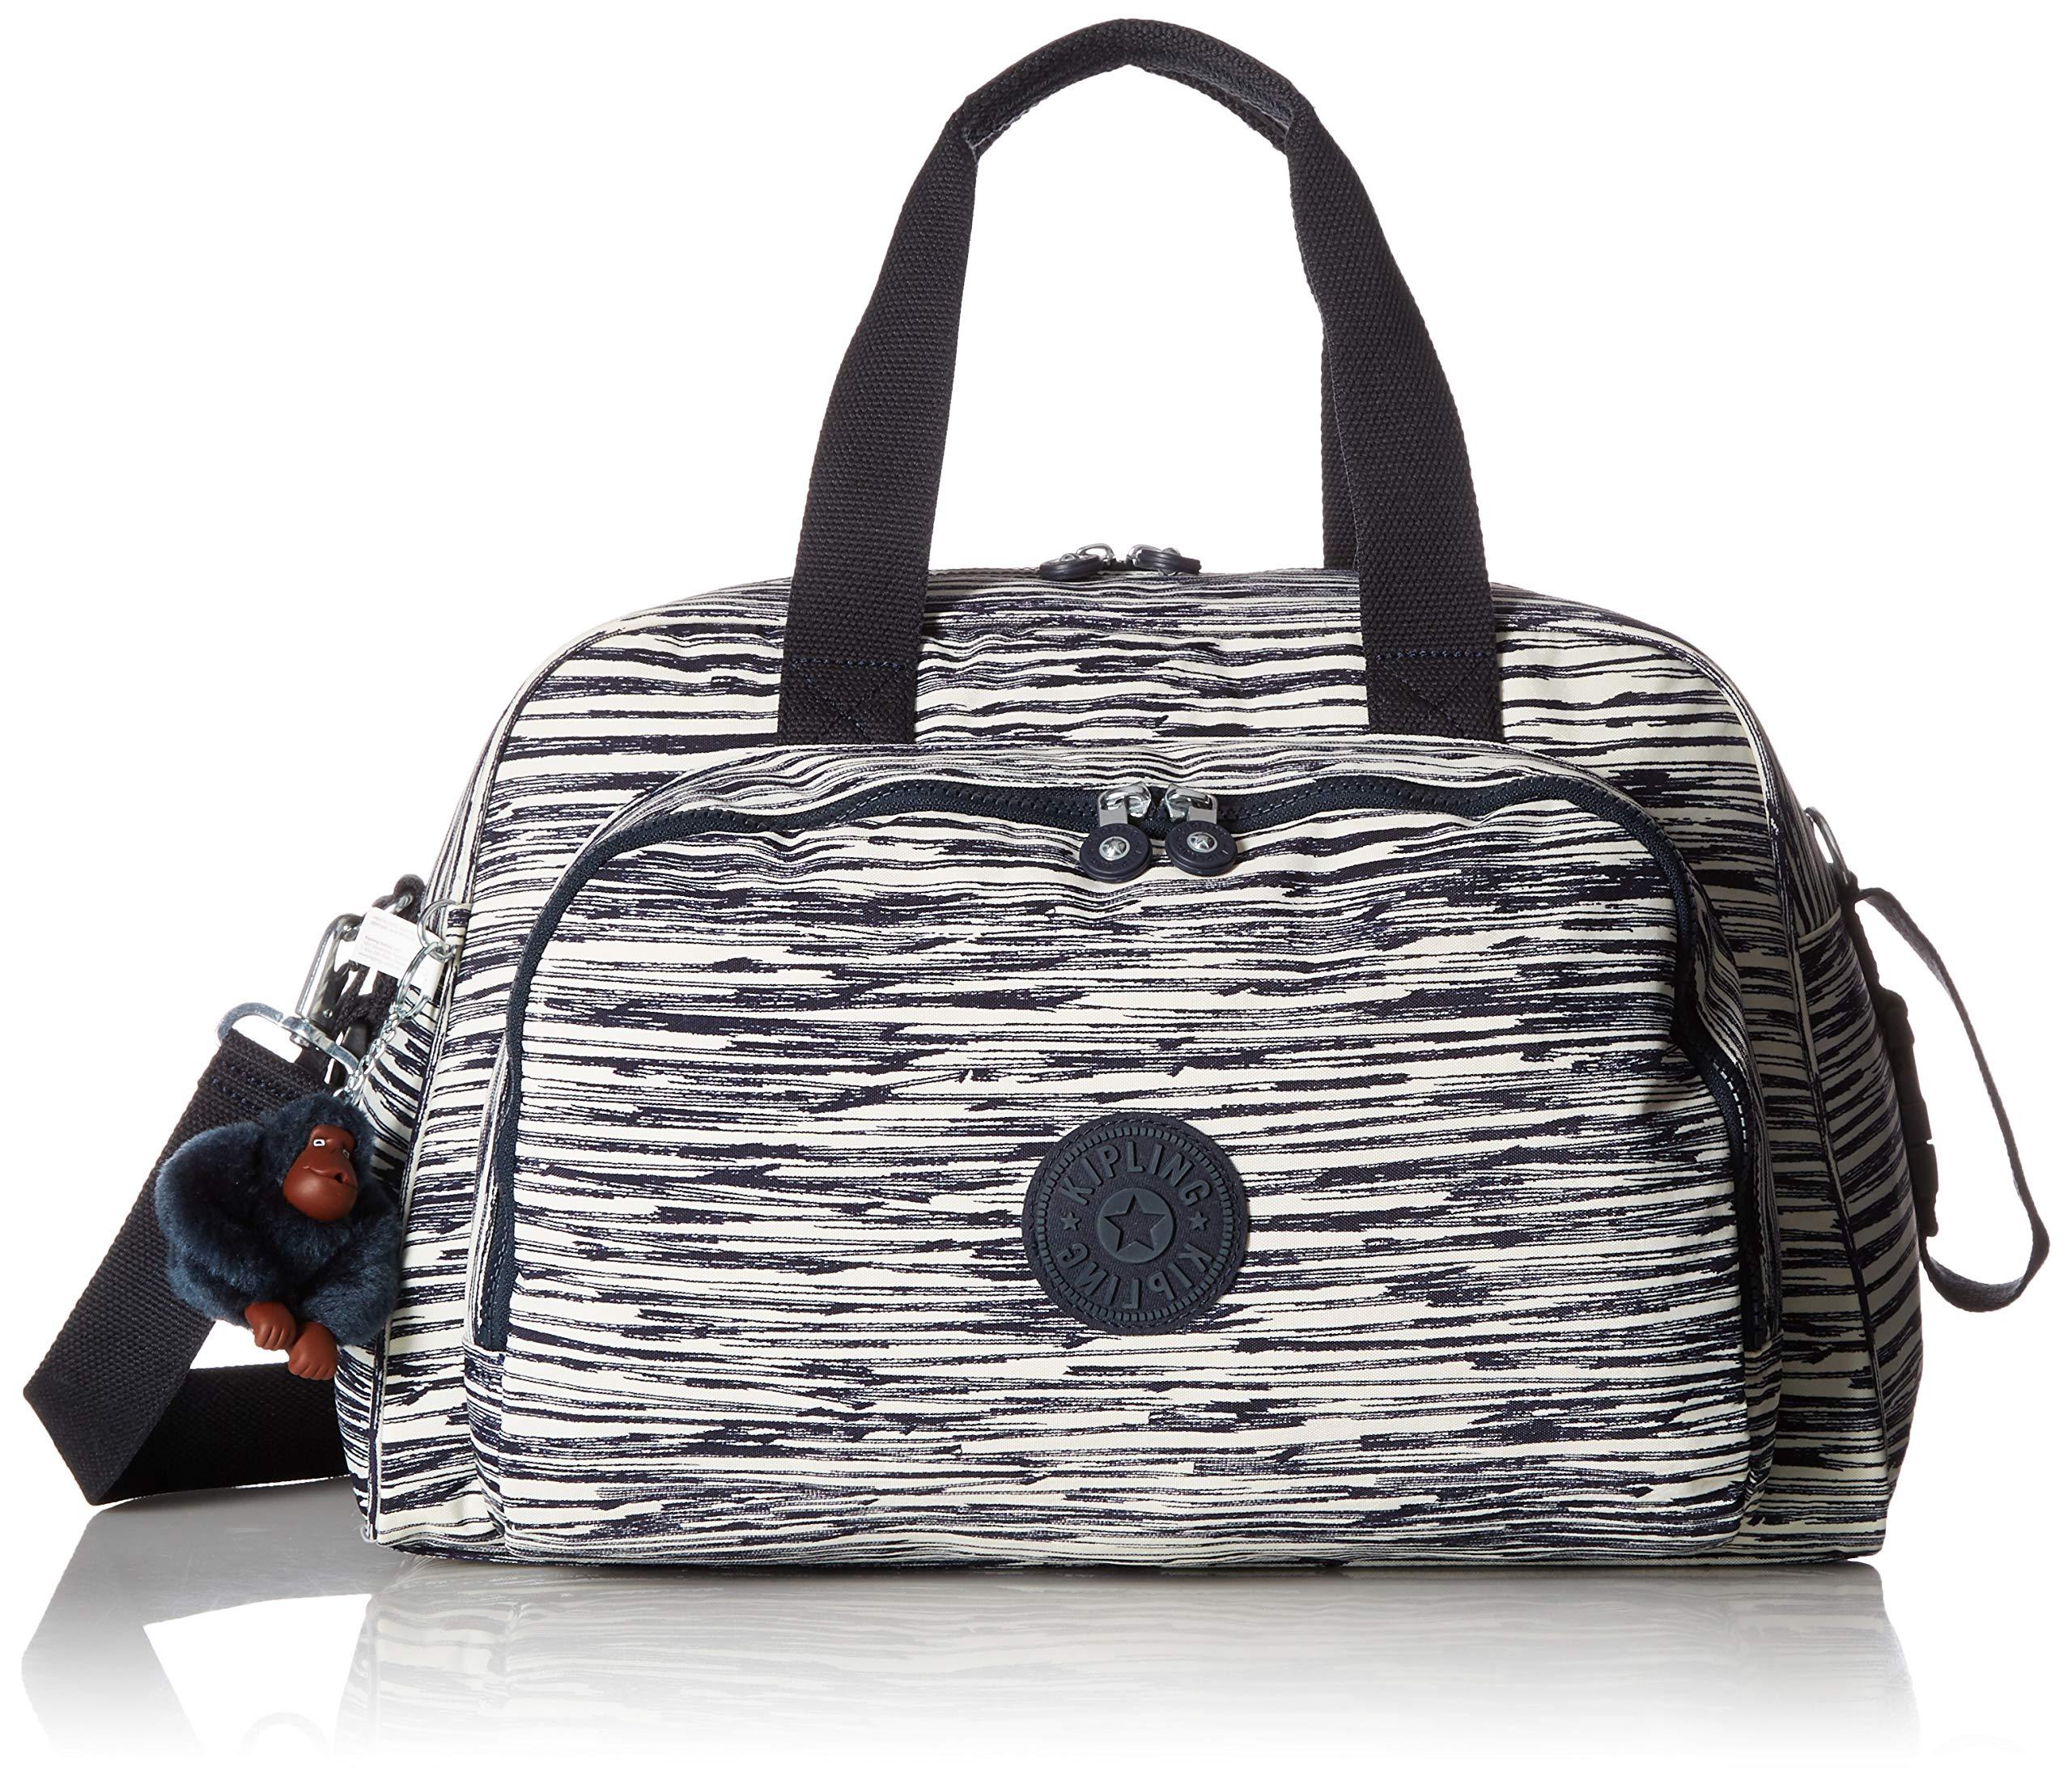 Kipling Camama Diaper Bag, Stroller Clips, Insulated Bottle Holder, Zip Closure, Scribble Lines Blue